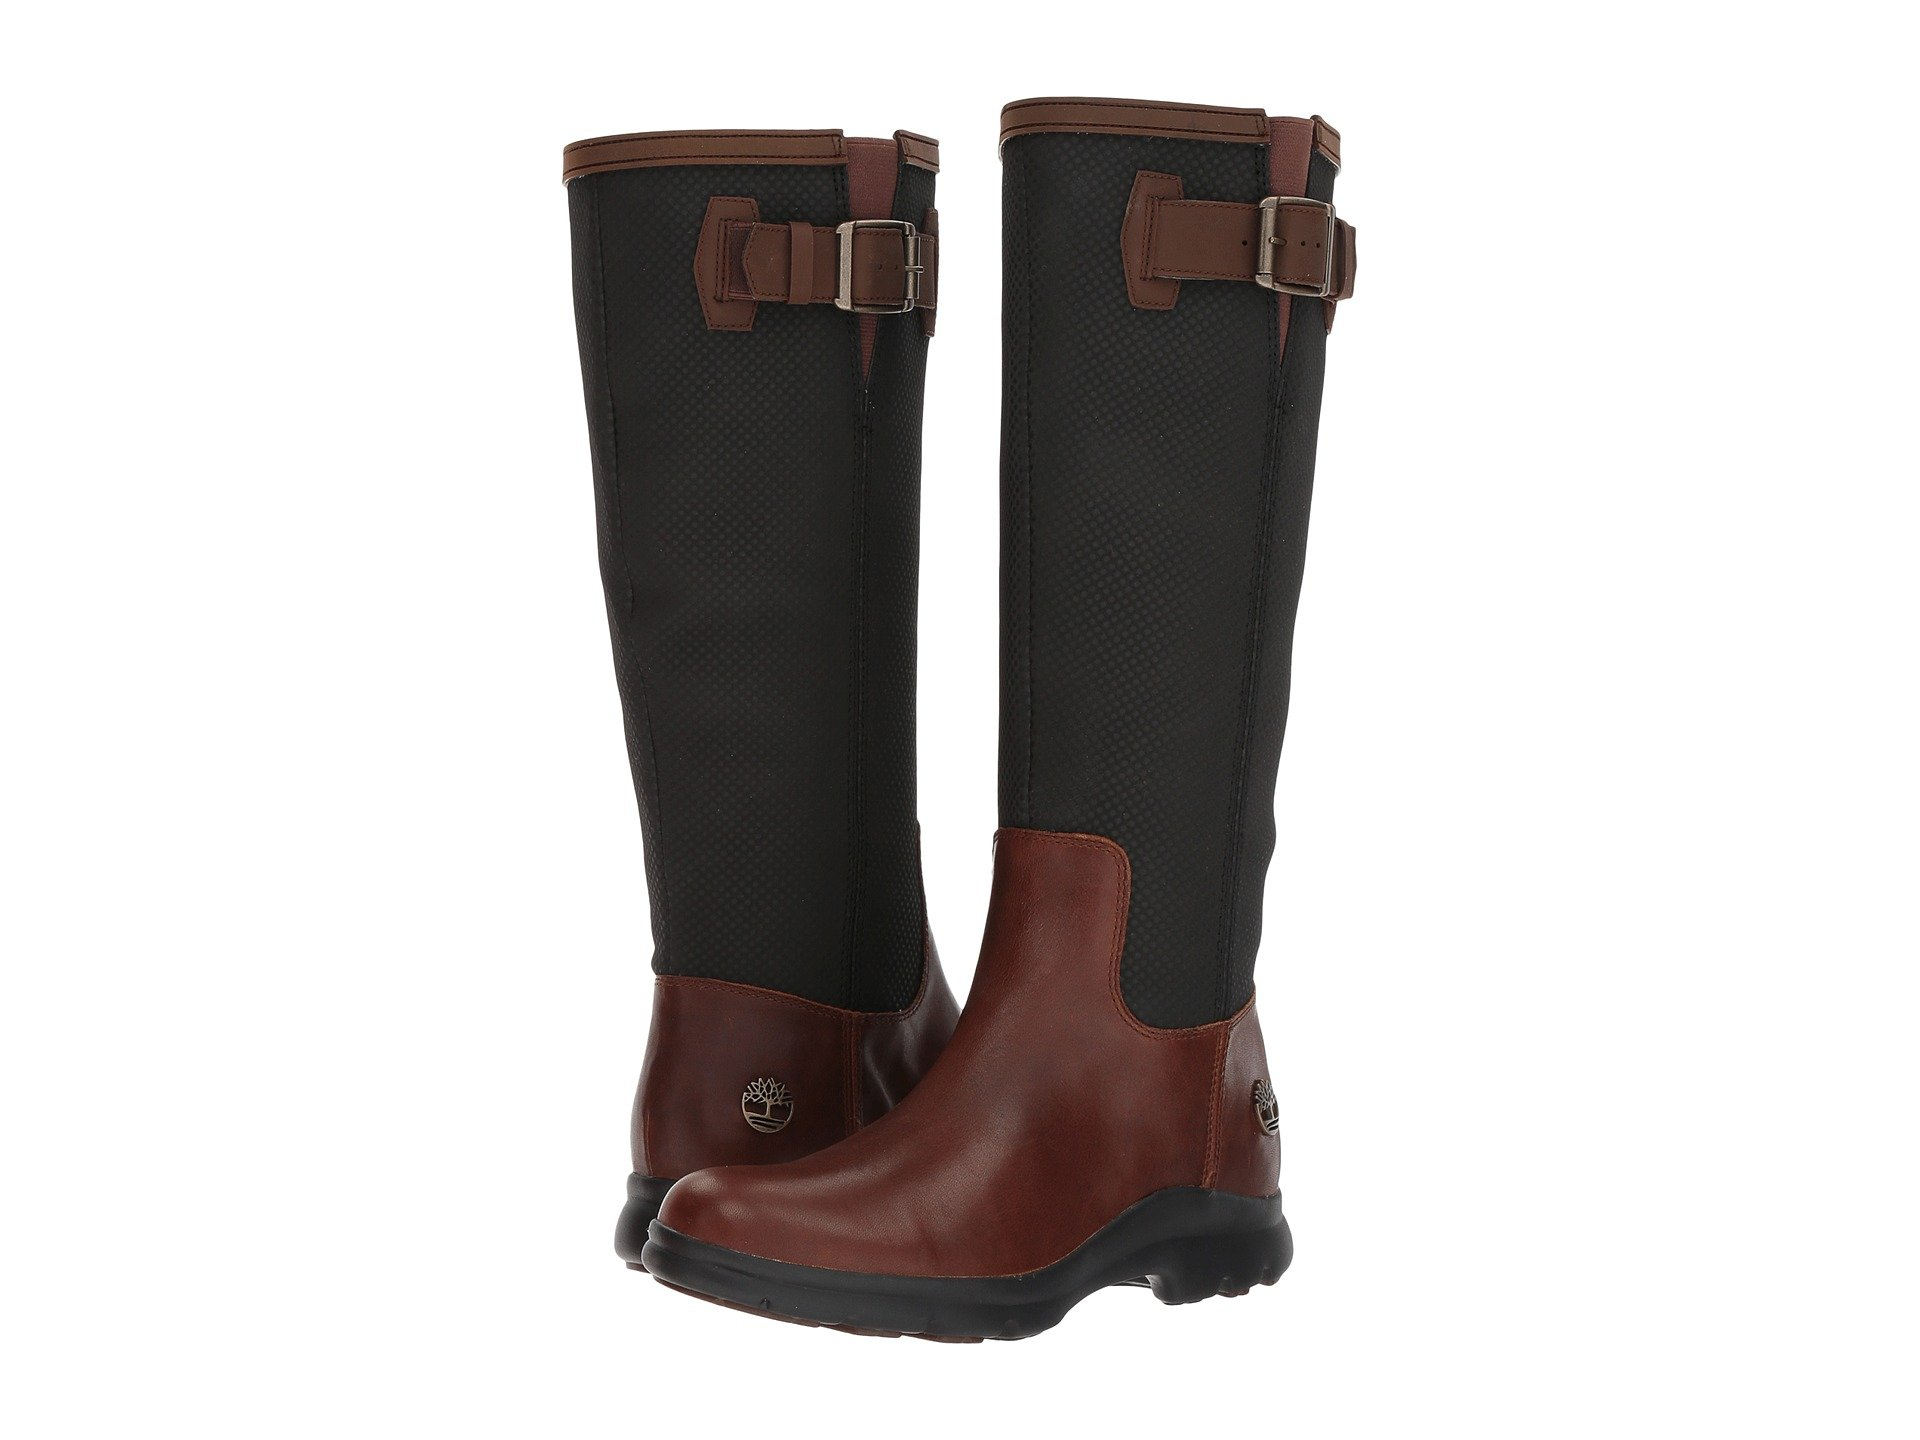 Turain Tall Waterproof Boot